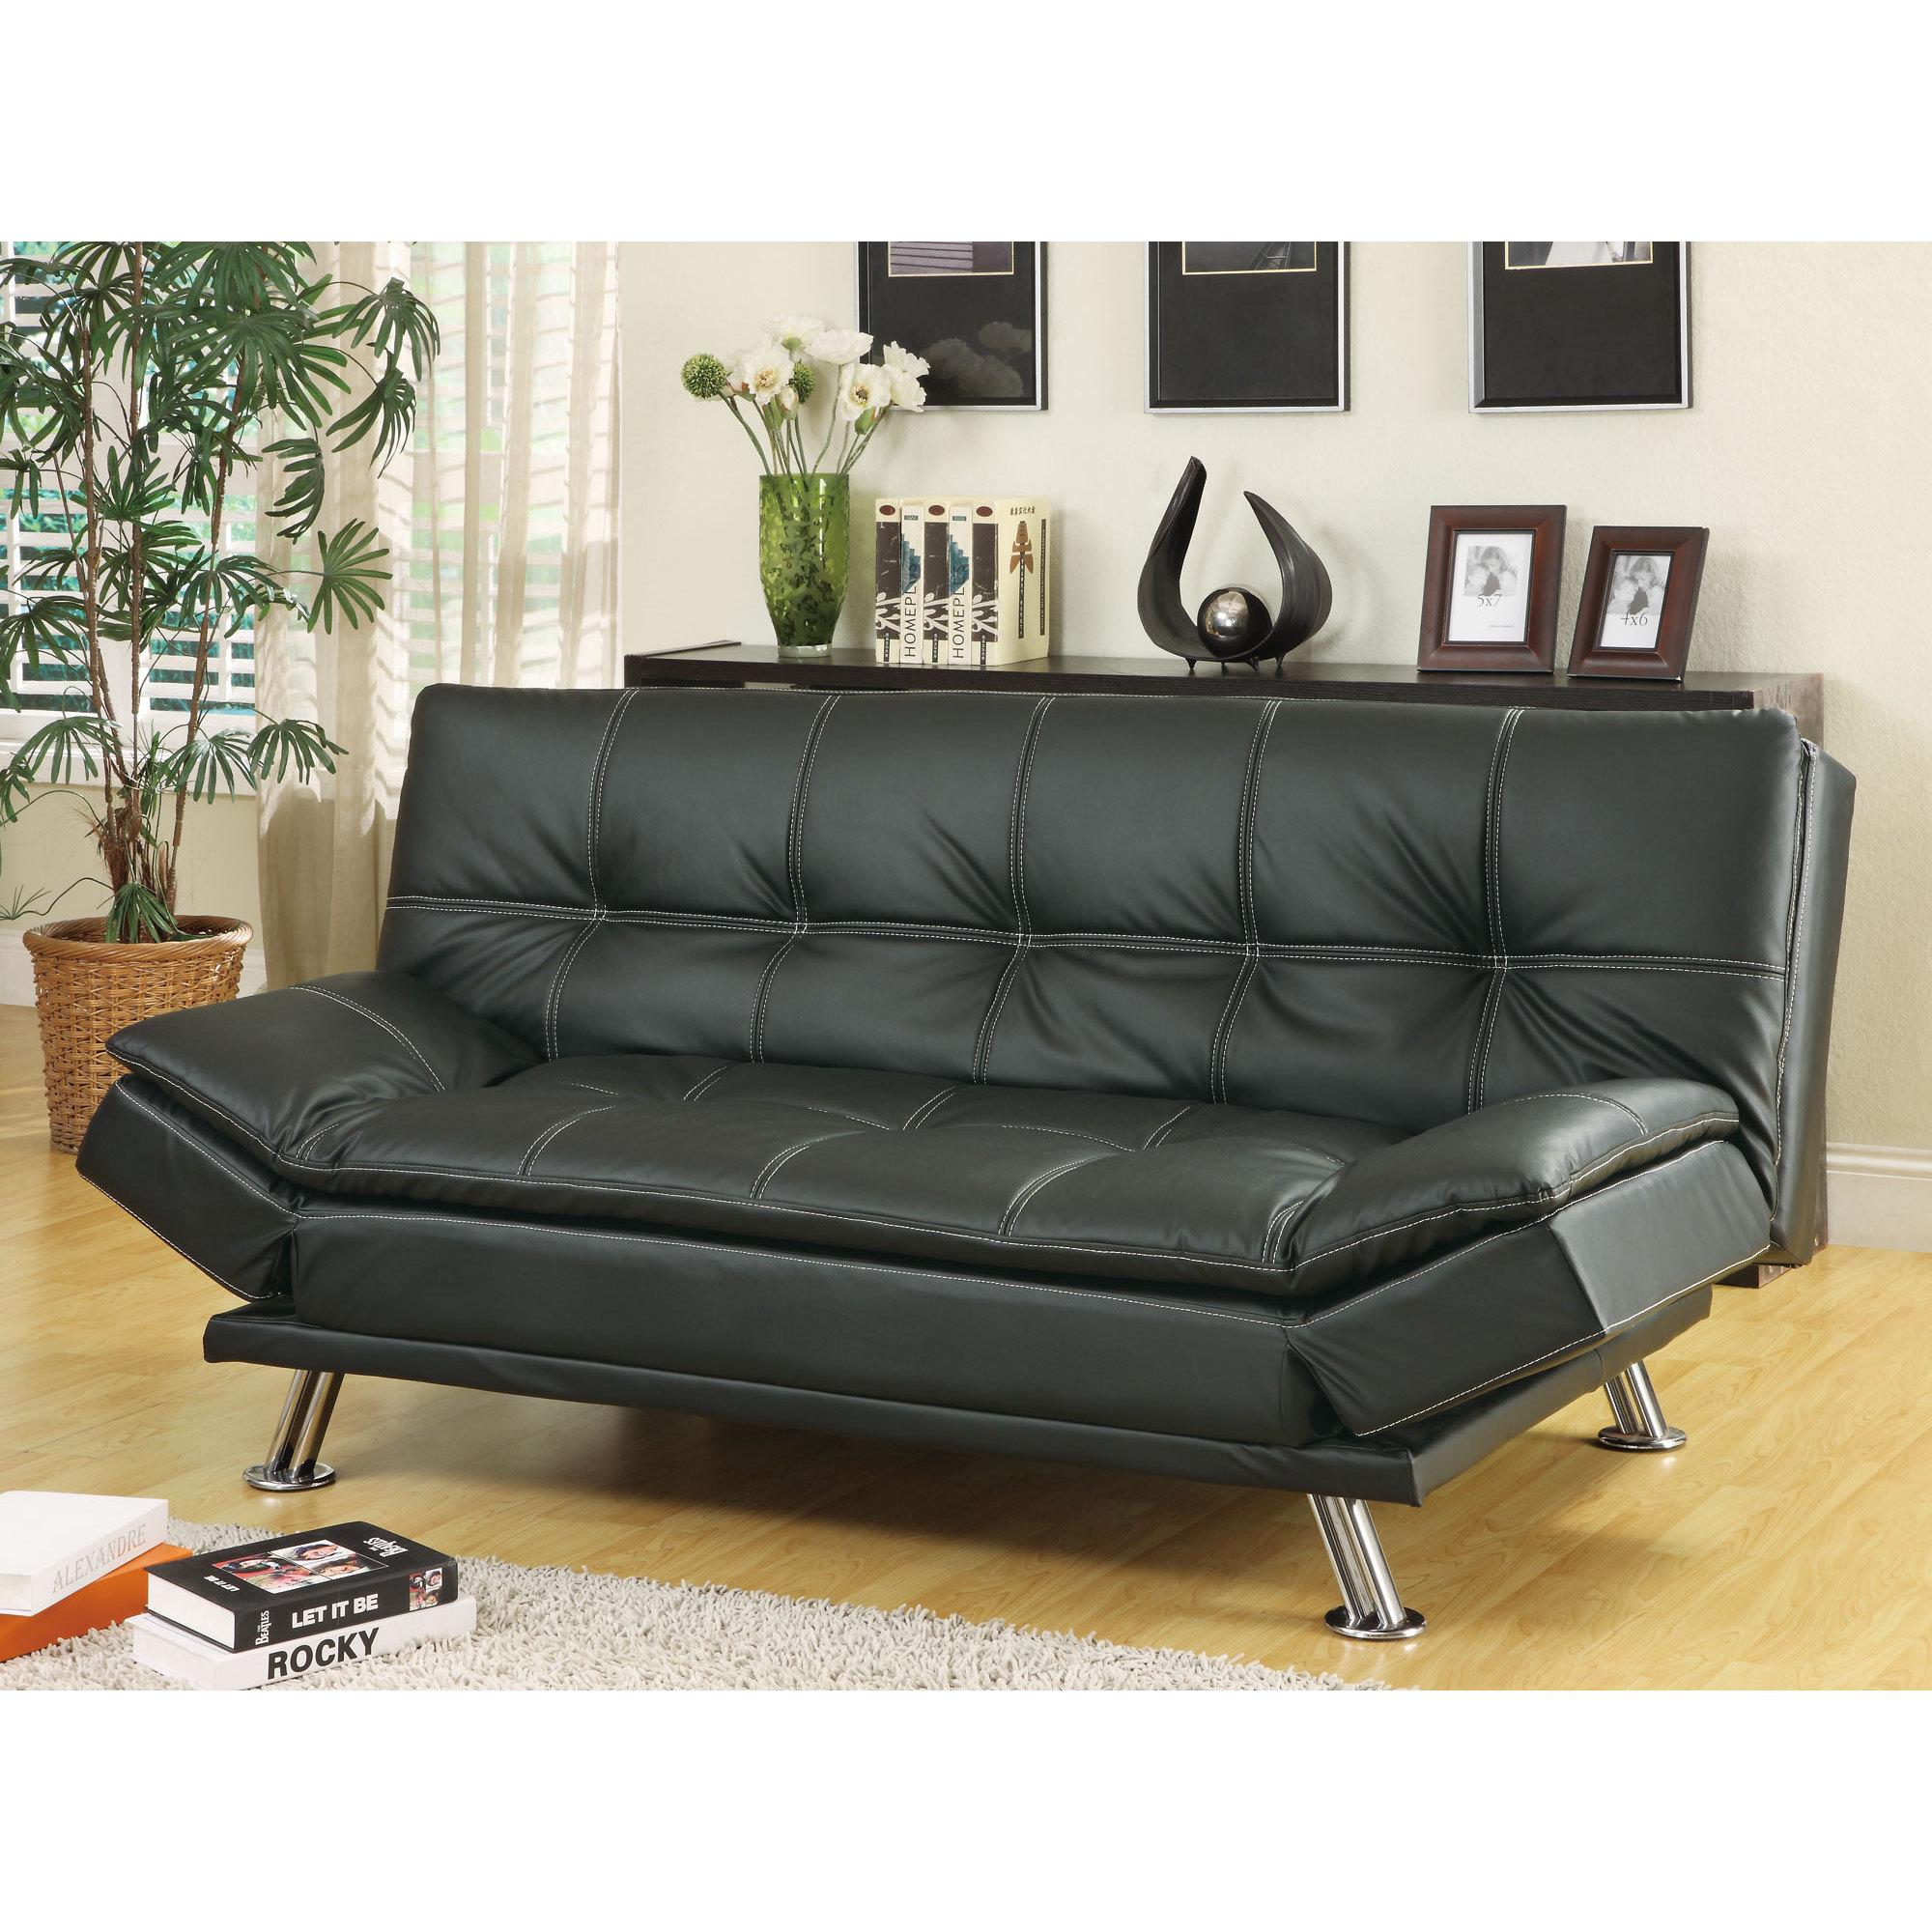 Coaster Company Transitional Sofa Bed Ebay # Muebles Coaster